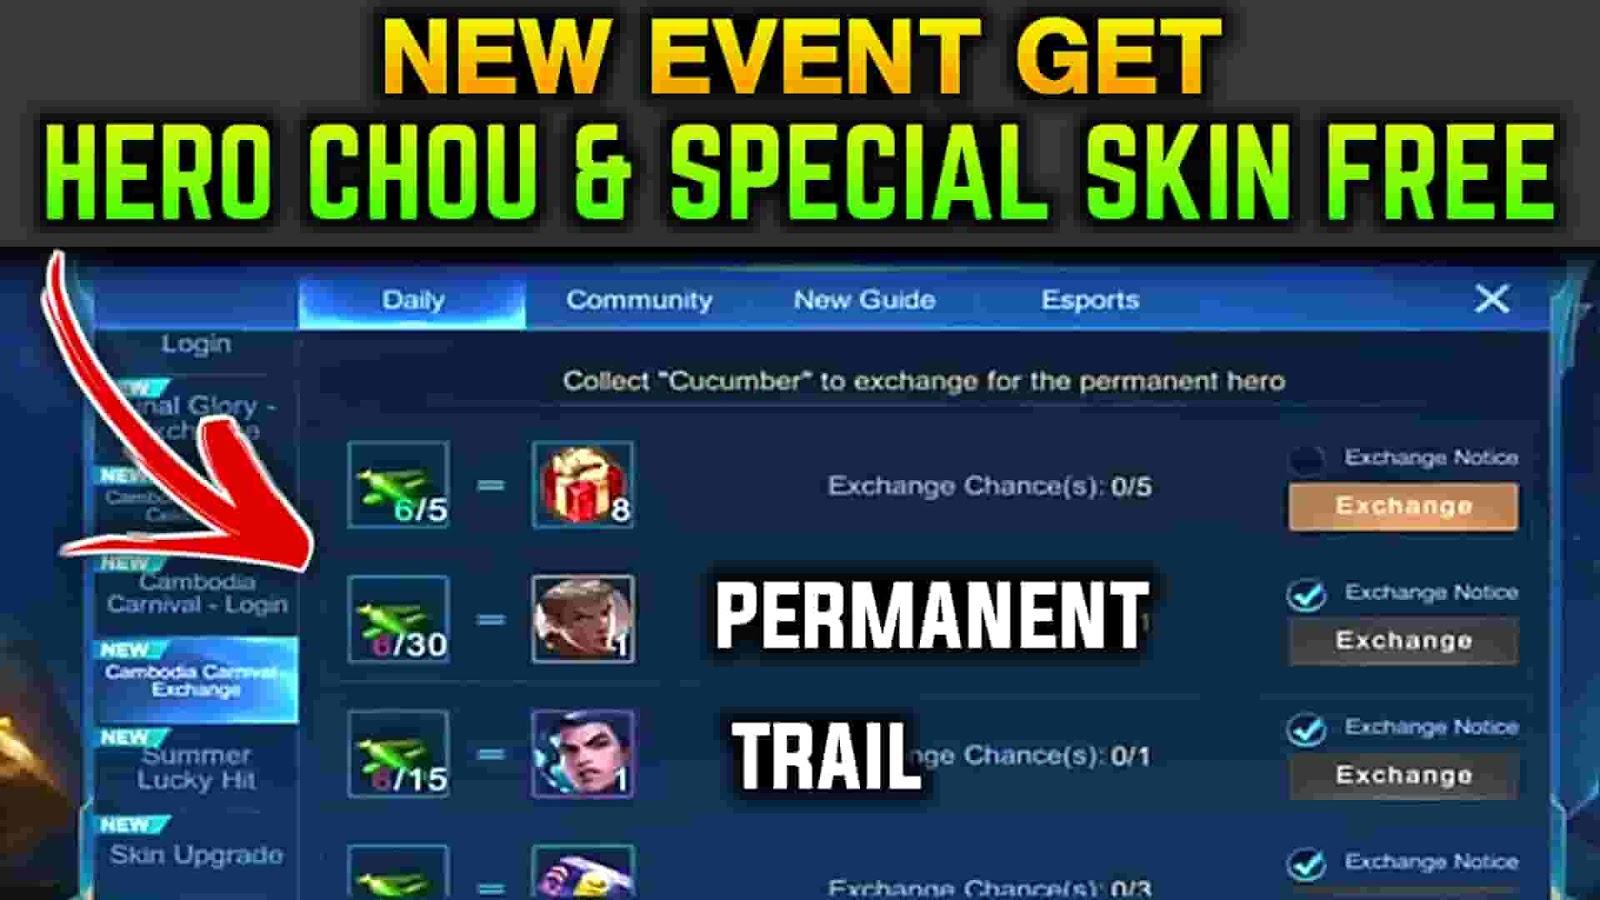 how to get free hero in mlbb,mlbb free hero event